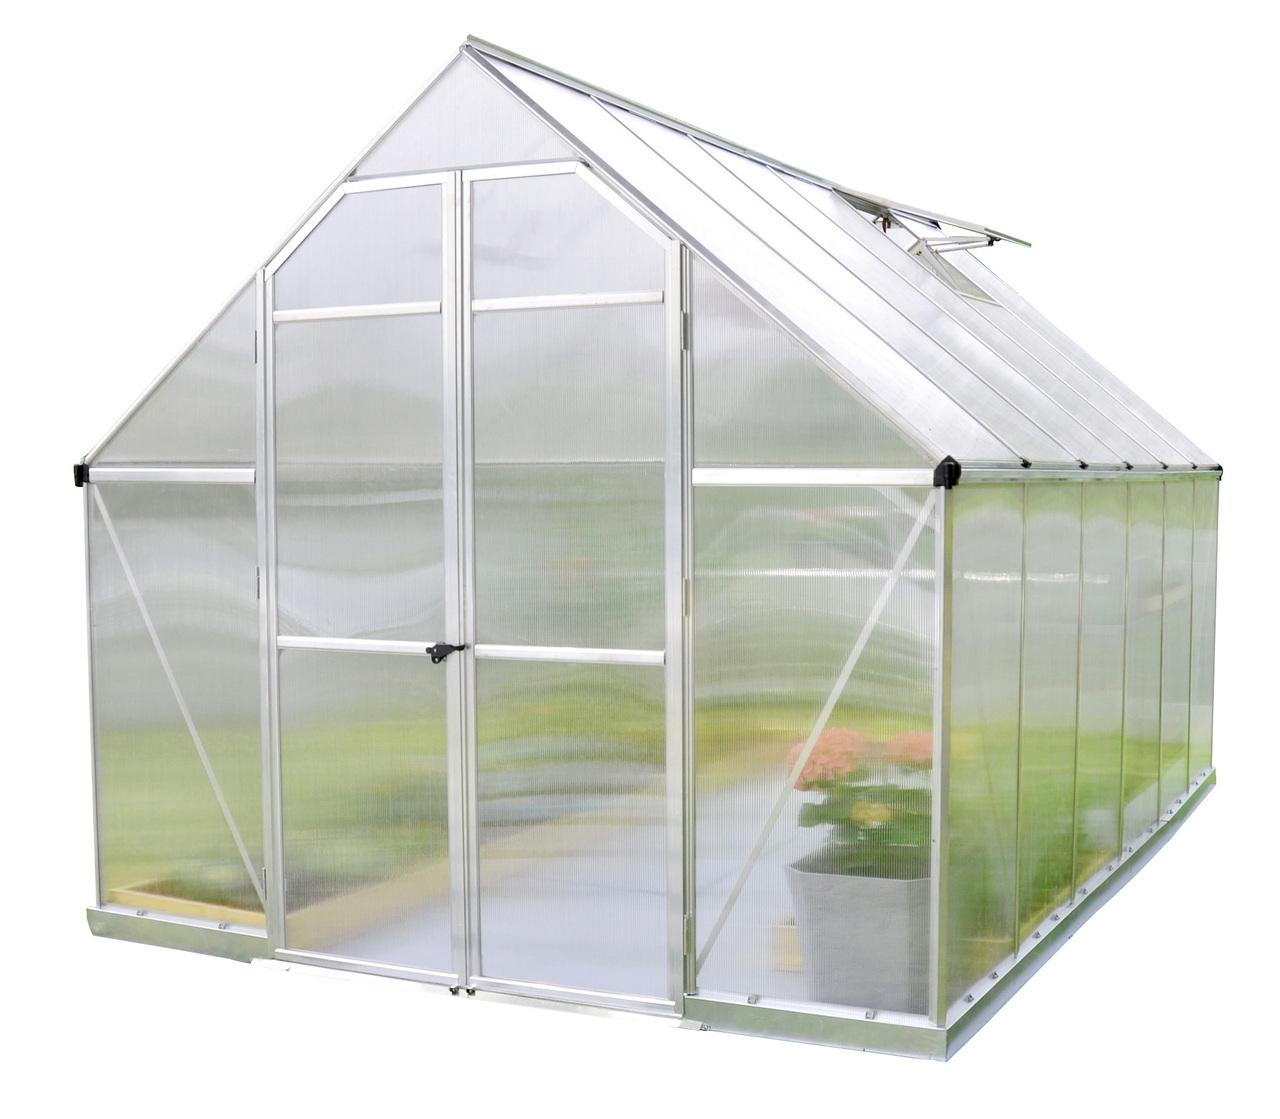 Essence 8' x 12' Hobby Greenhouse, Silver